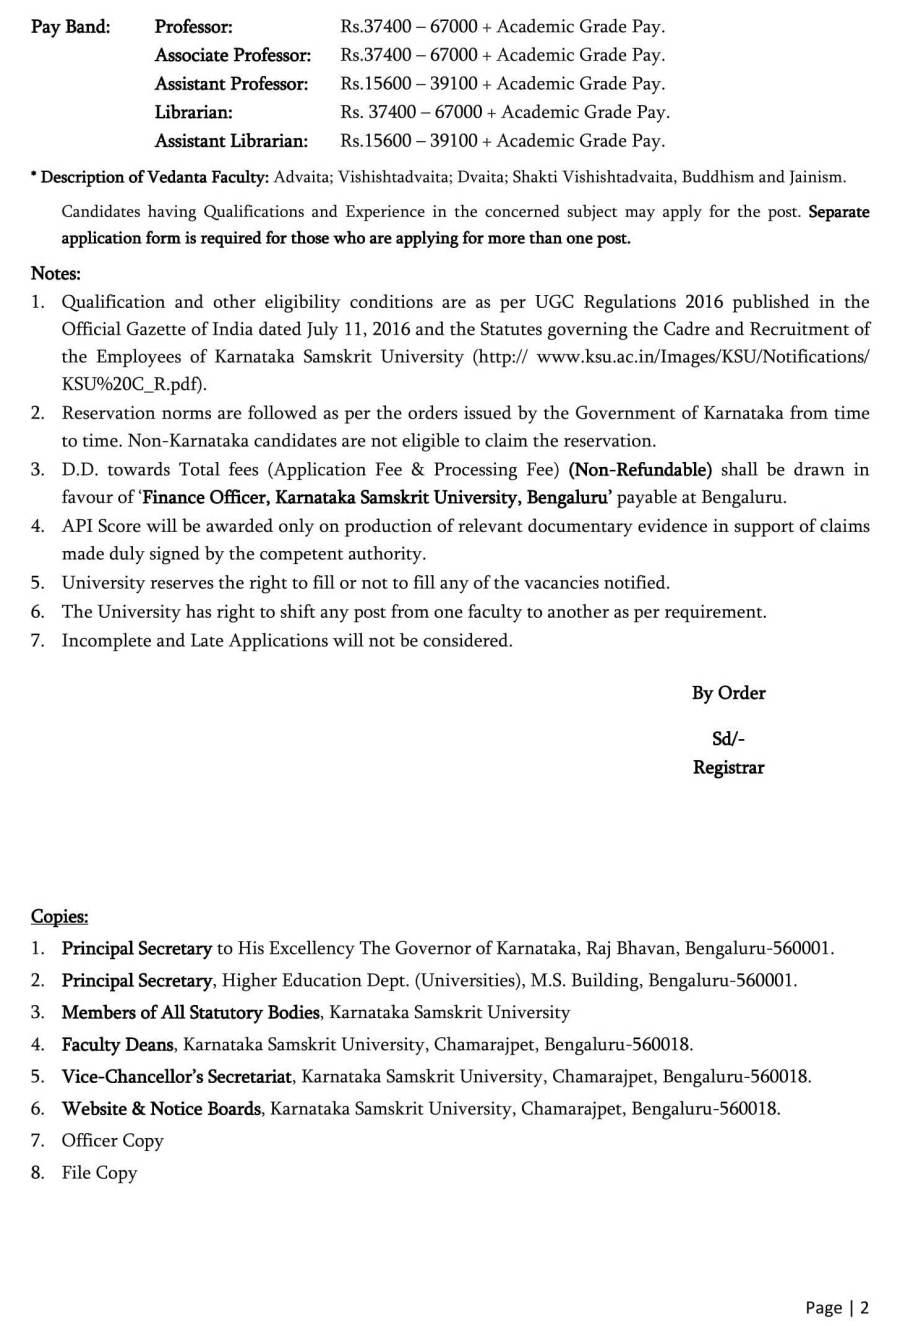 UGC-Pay-Scale-Teaching-Non-Teaching-Recruitment-Notification-2.jpg